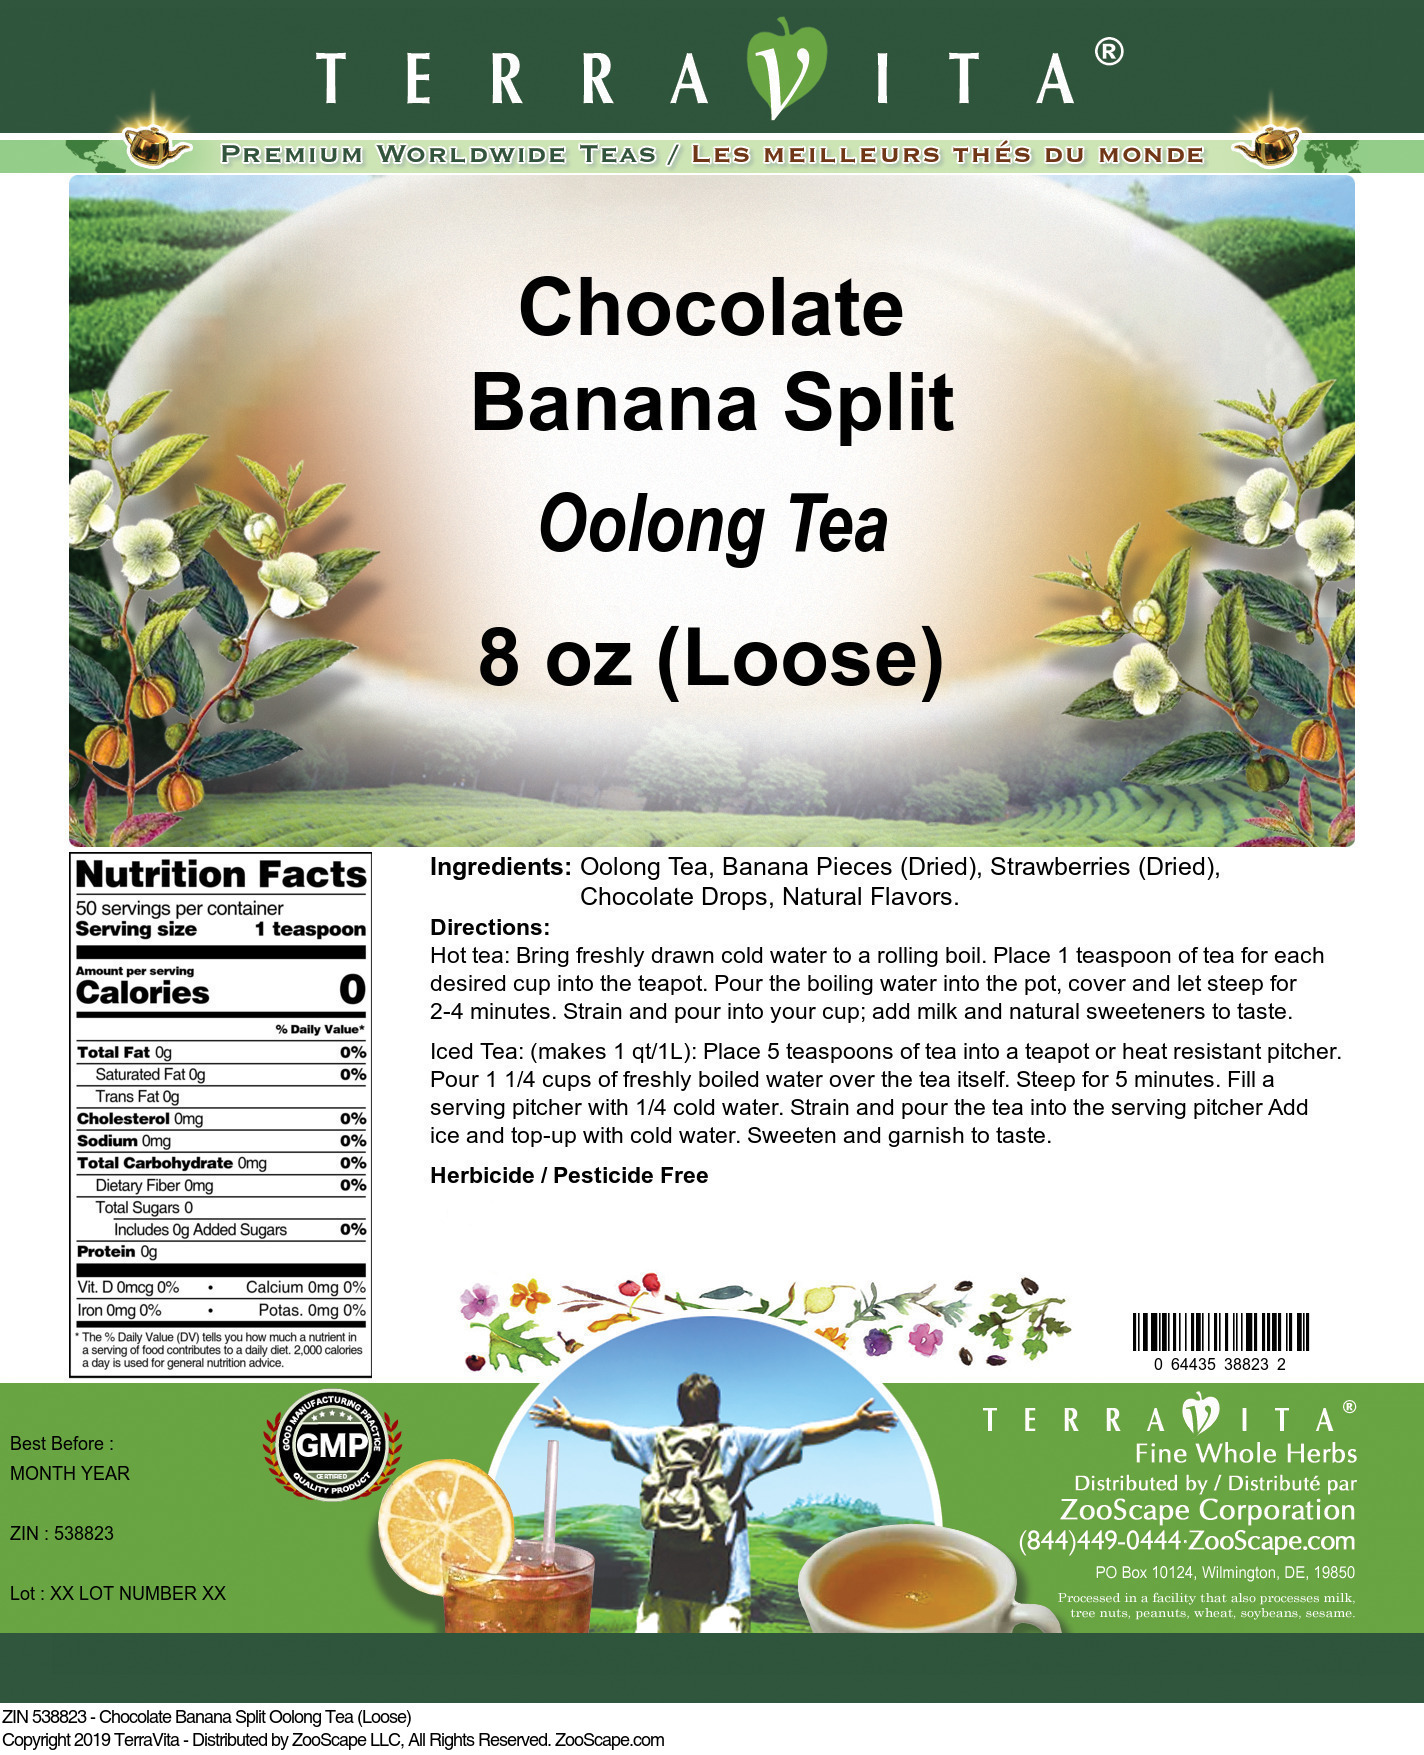 Chocolate Banana Split Oolong Tea (Loose)